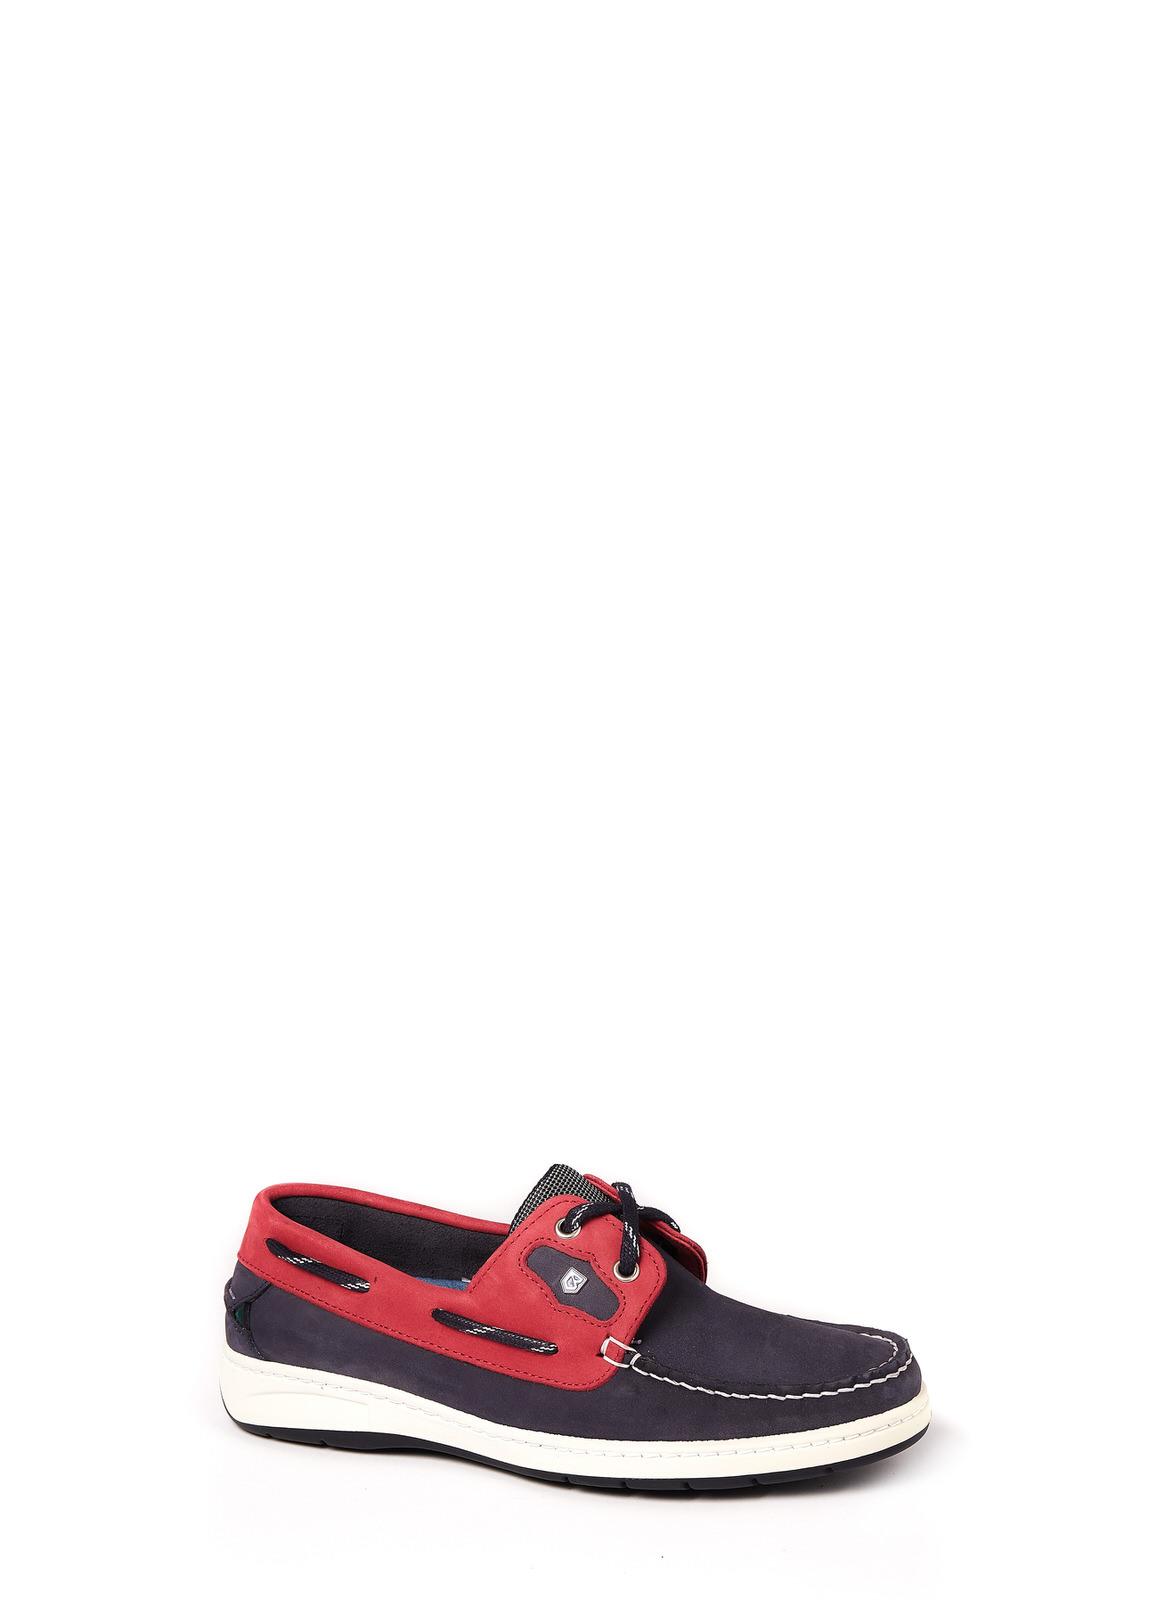 Dubarry_Cannes Deck Shoe - Denim/Red_Image_1